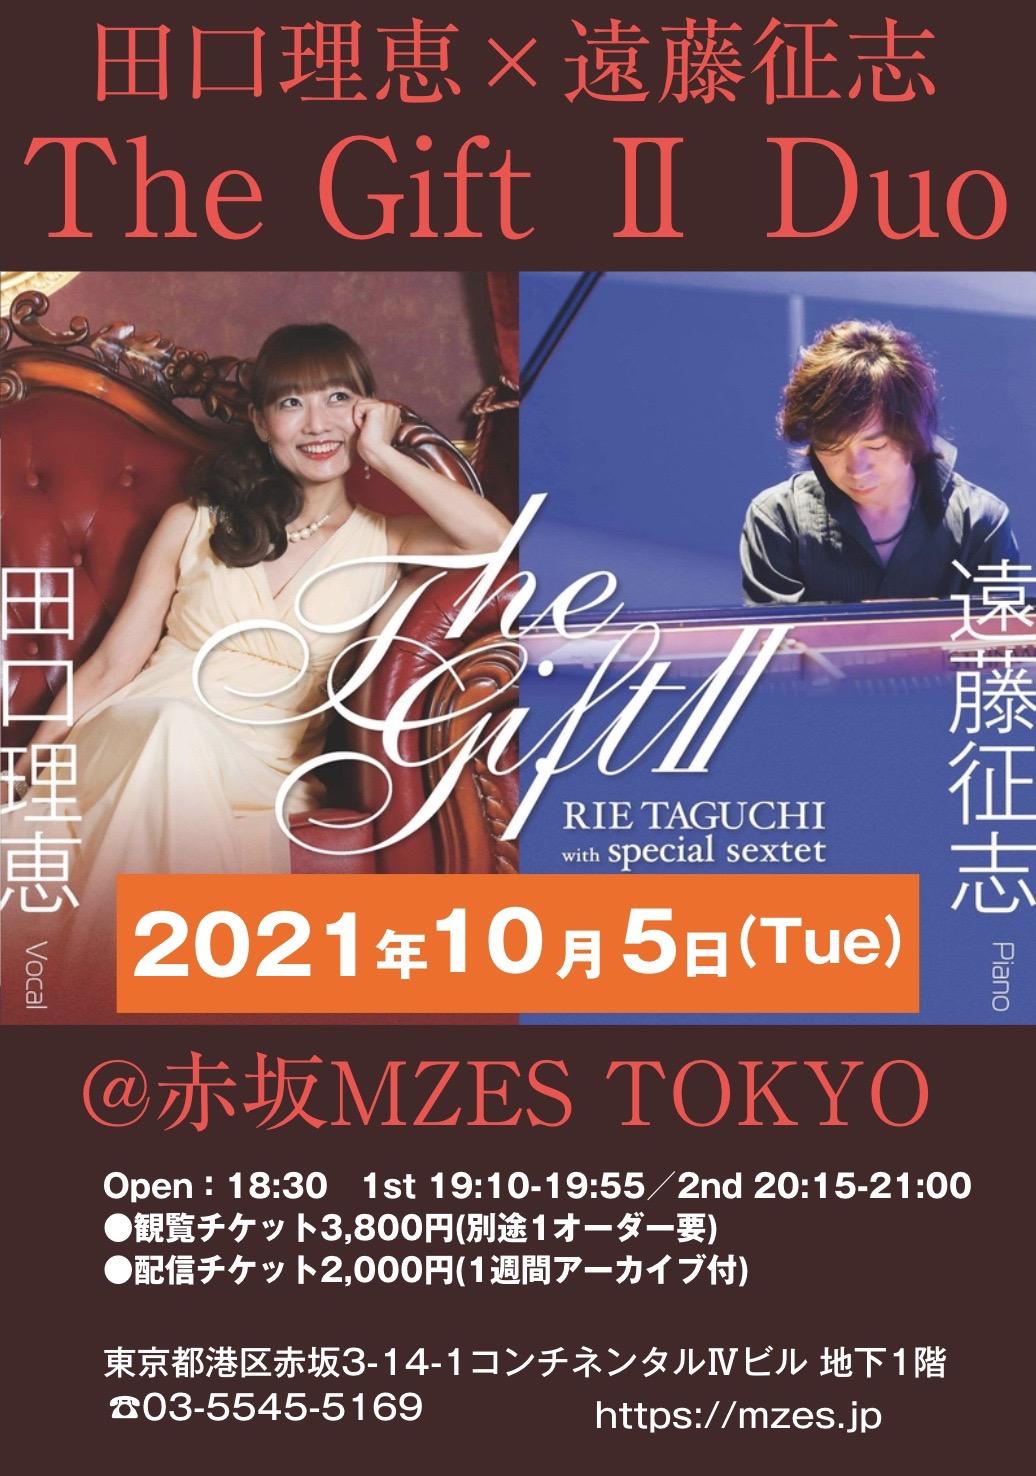 【配信】田口理恵×遠藤征志 The Gift Ⅱ Duo